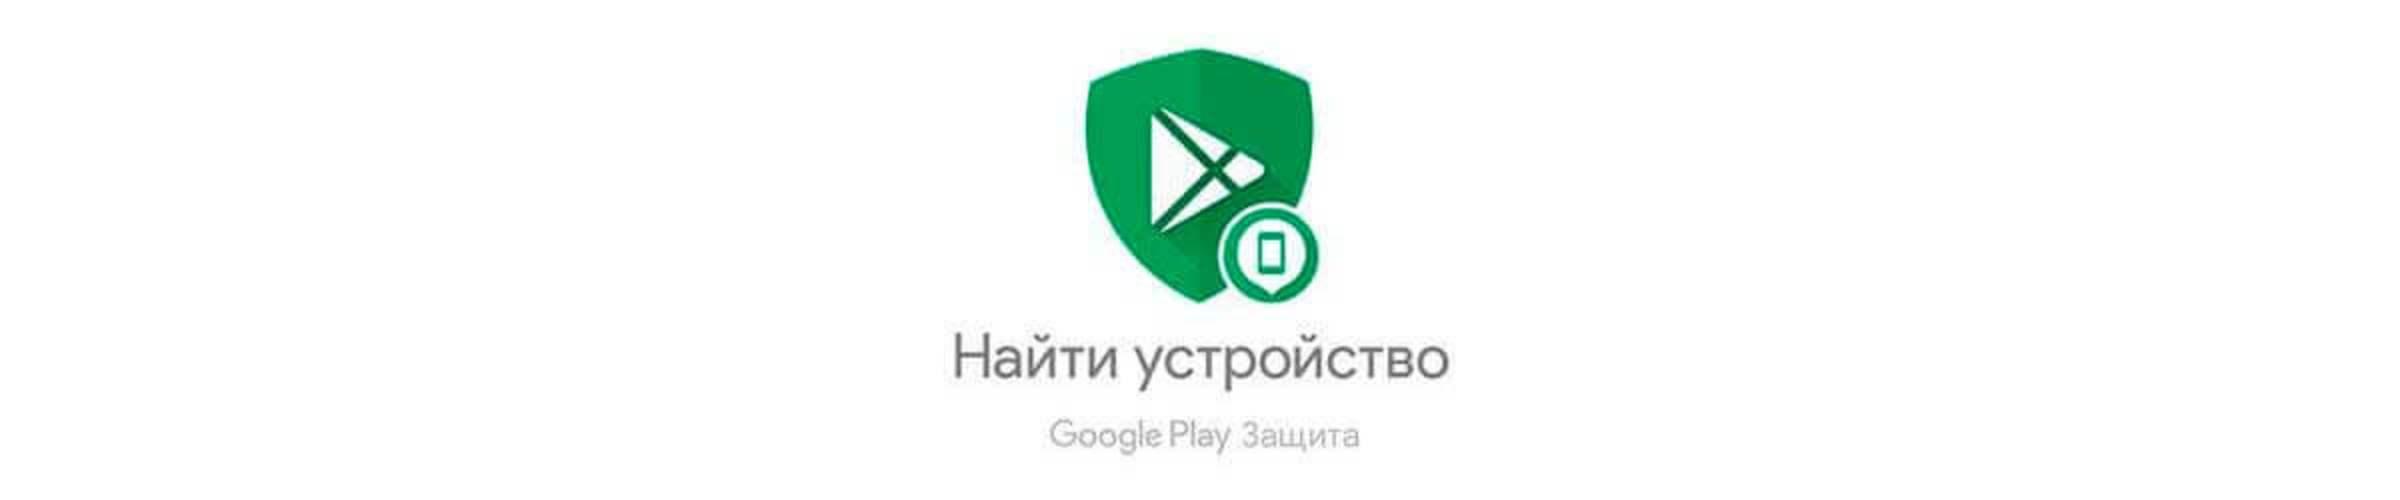 Как найти телефон через Google аккаунт?